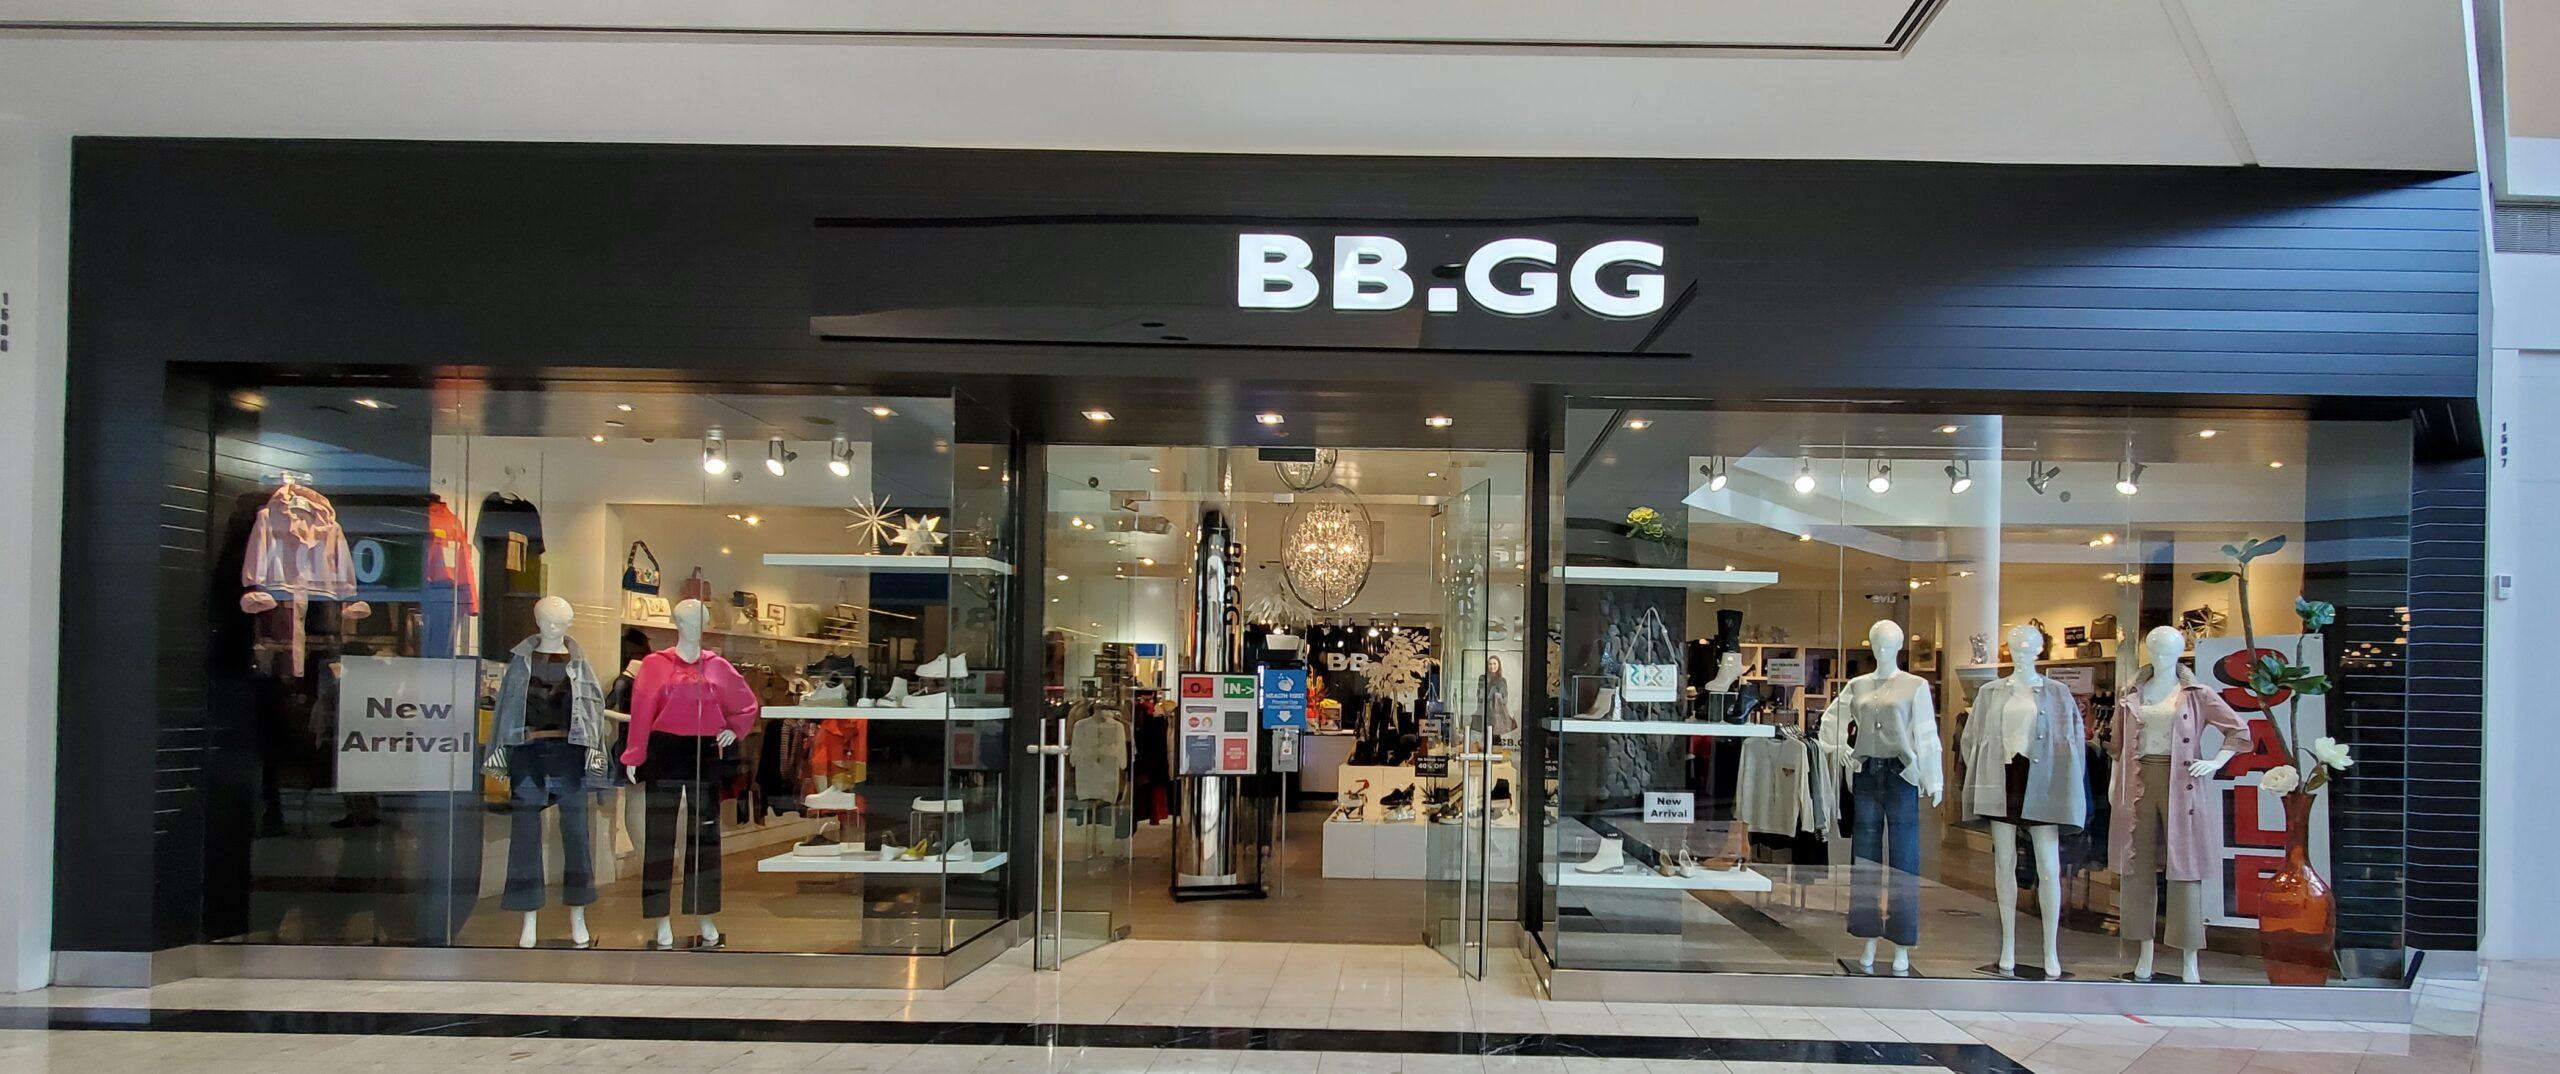 BB.GG Fashion at CF Richmond Centre.